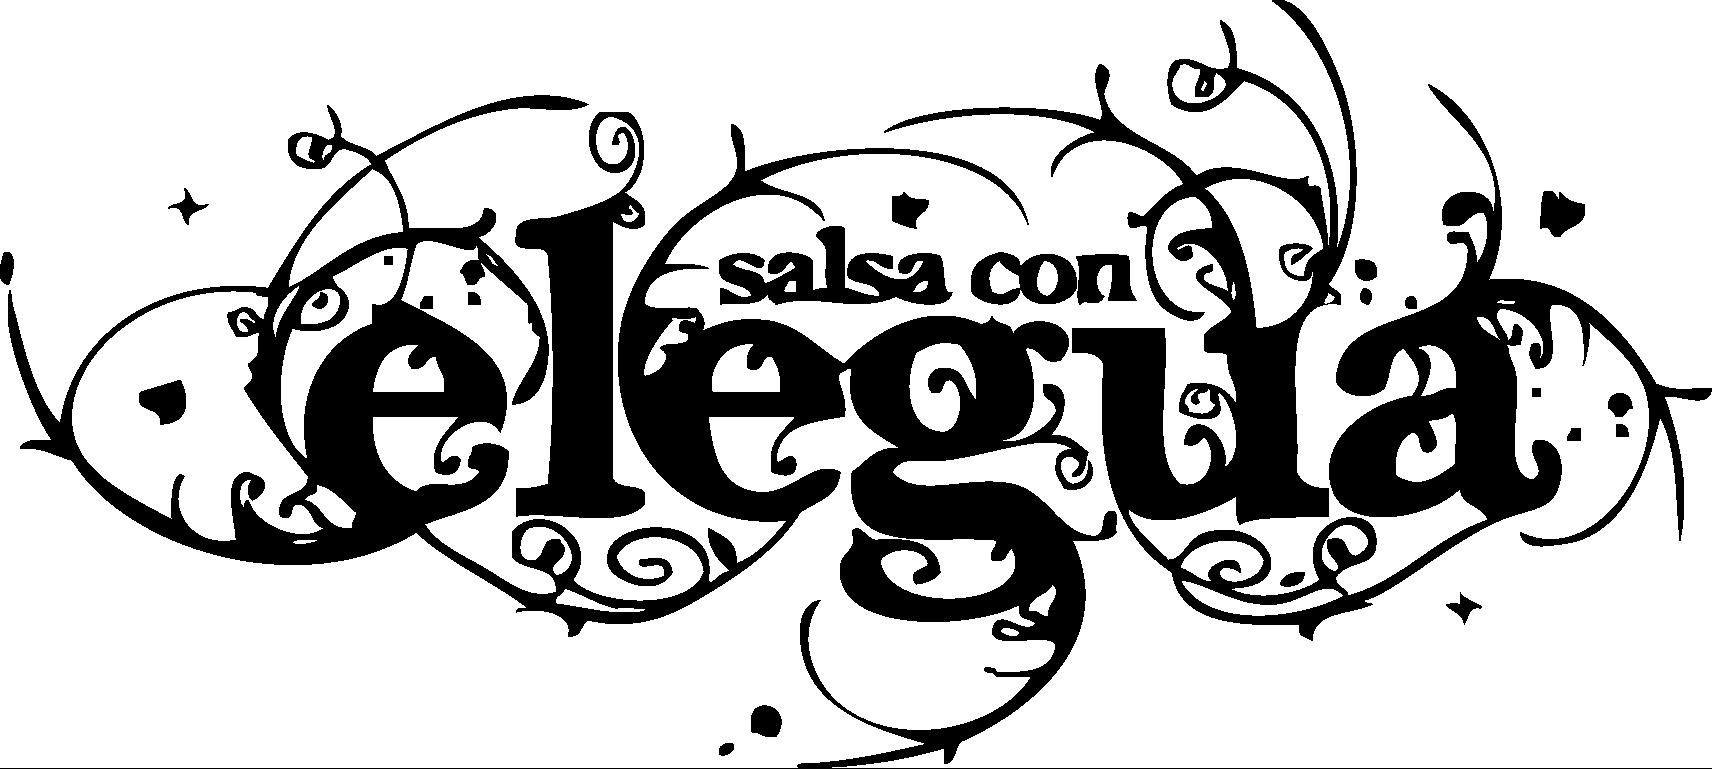 Logo elegua black and white